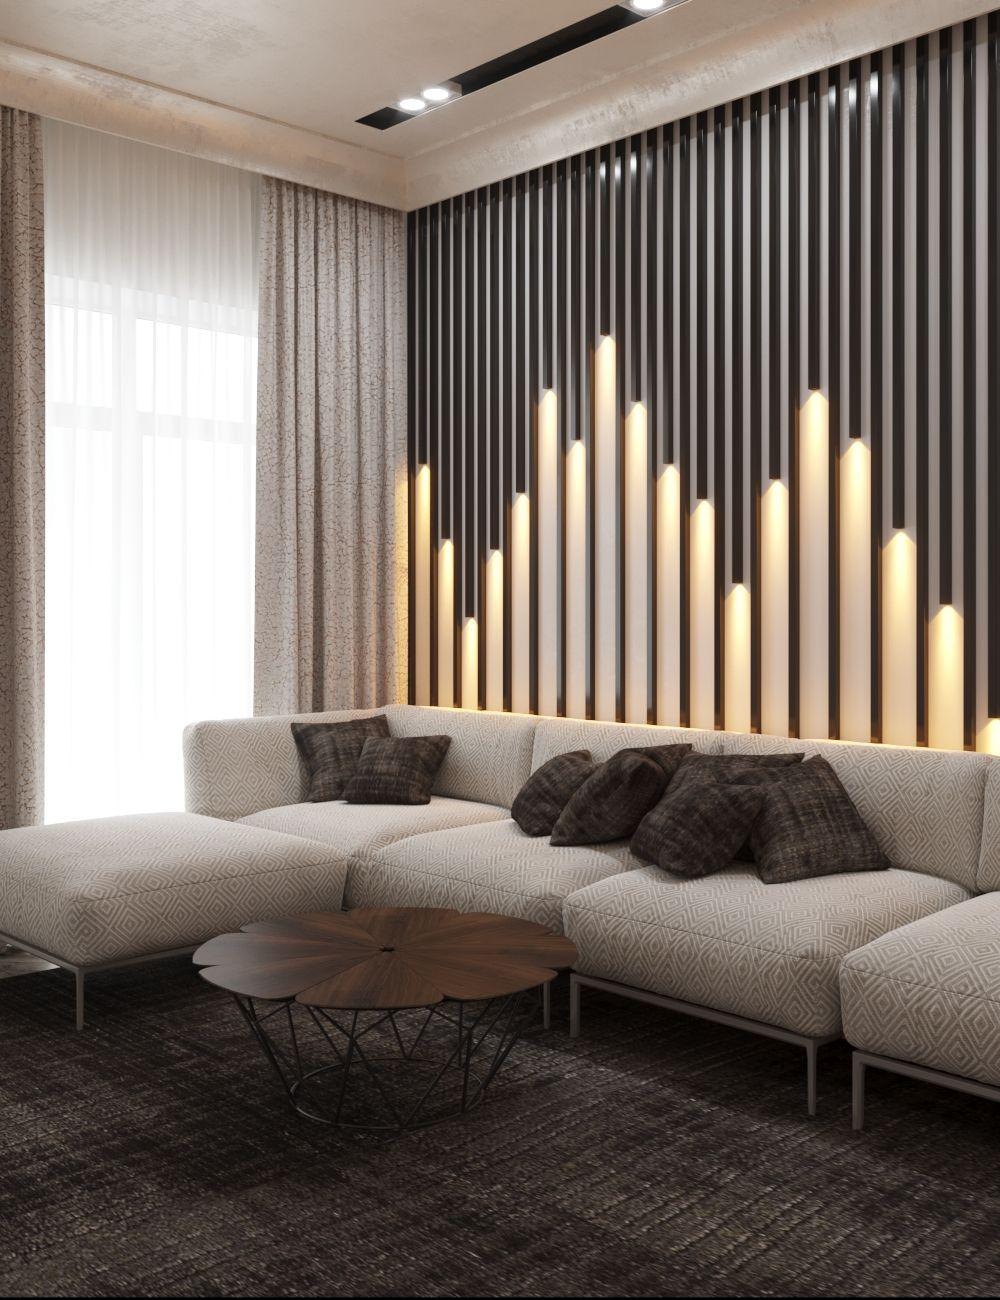 Dlya Sebya Wall Paneling Ideas Living Room Drawing Room Wall Design Room Interior